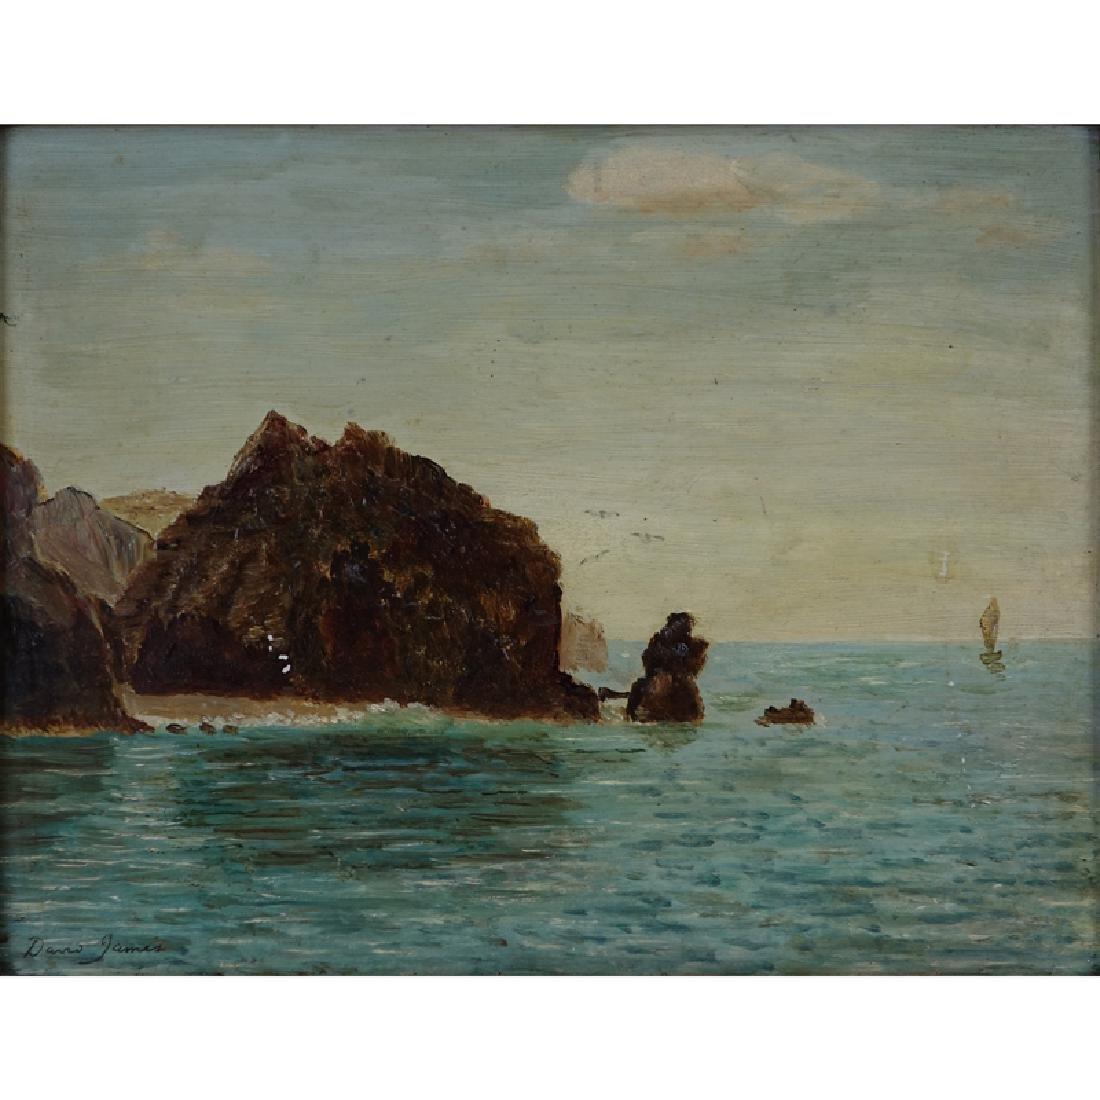 David James, British (1853 - 1904) Oil on Board, Near